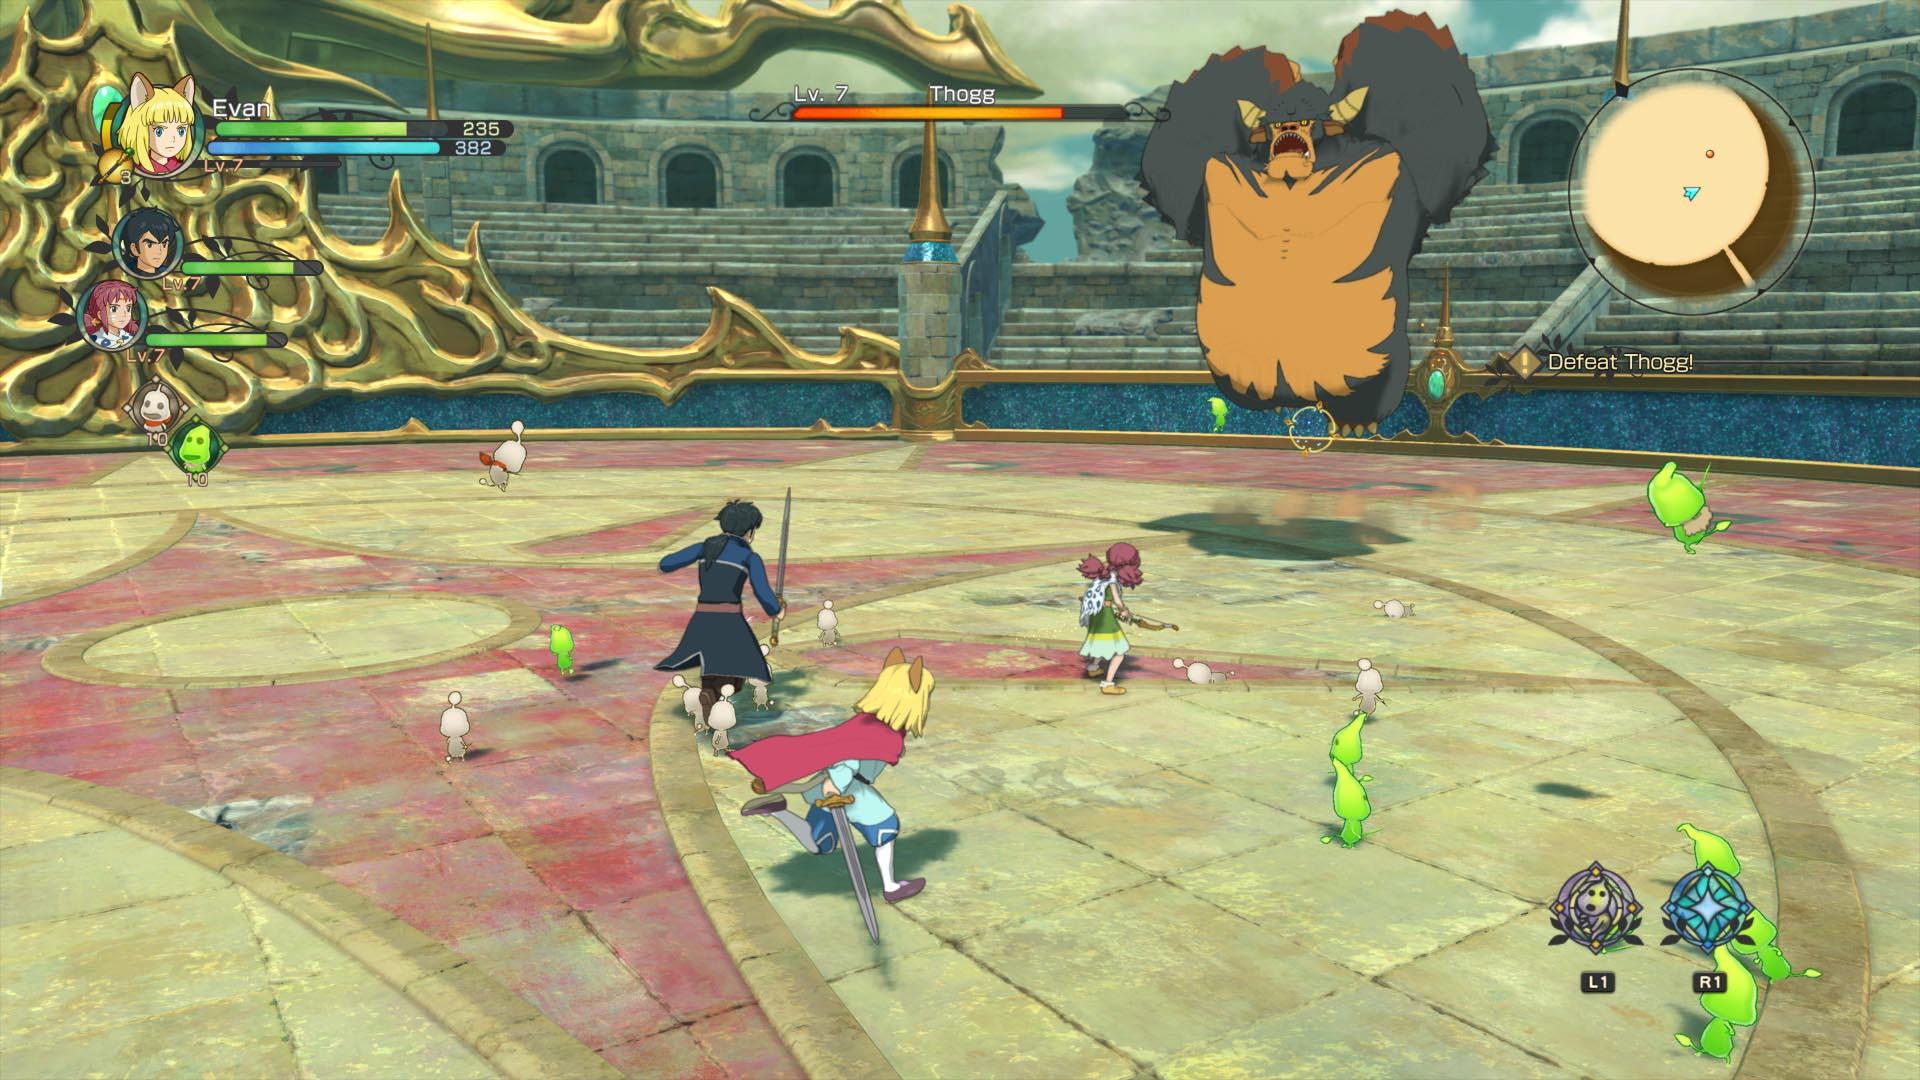 Ni no Kuni II: Revenant Kingdom - The Prince's Edition game image